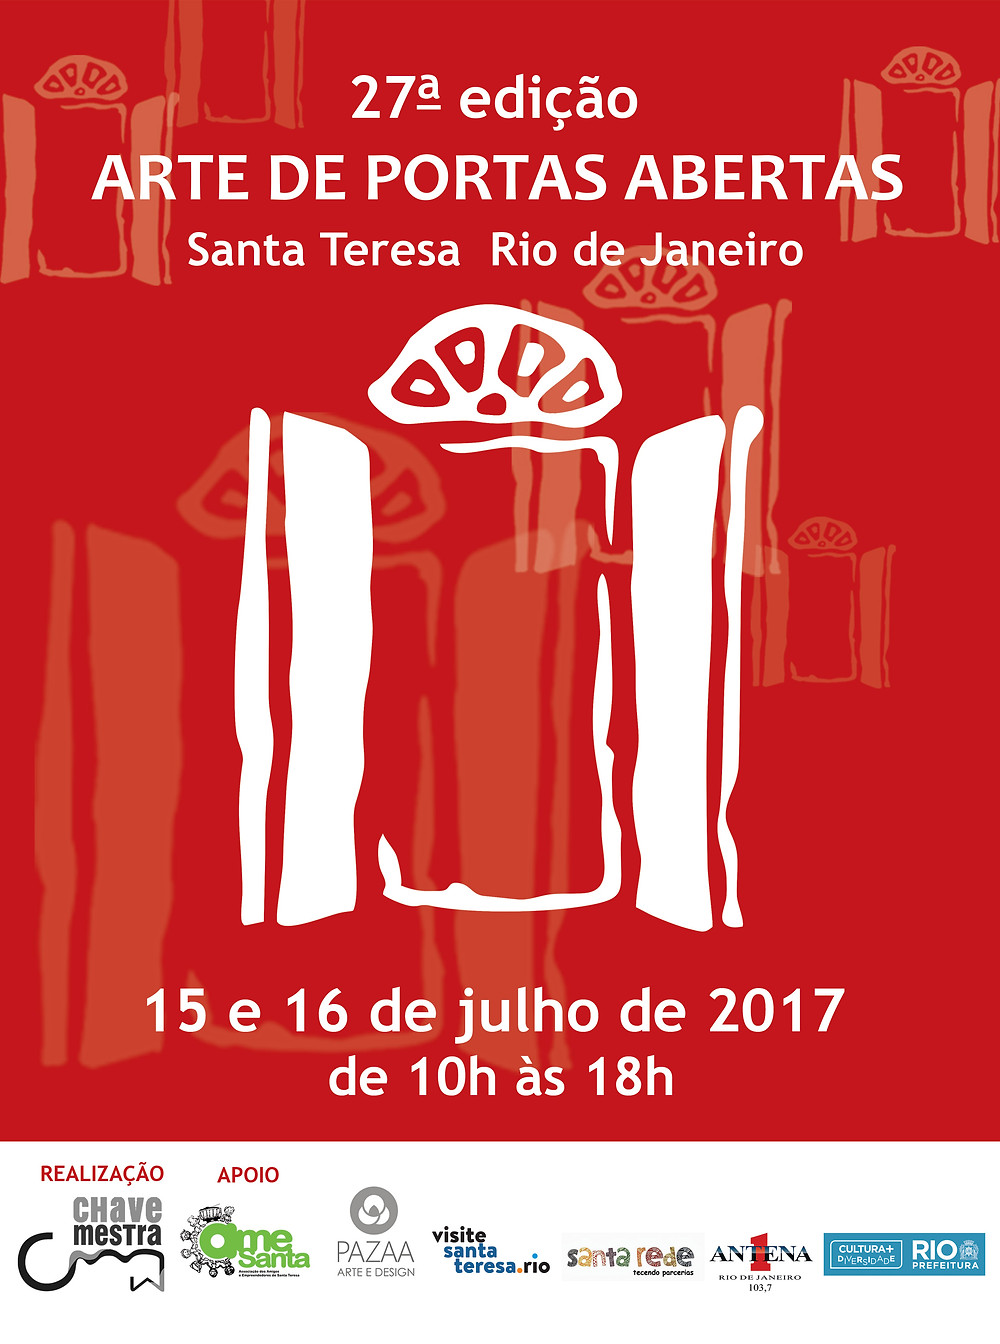 Arte de Portas Abertas 2017